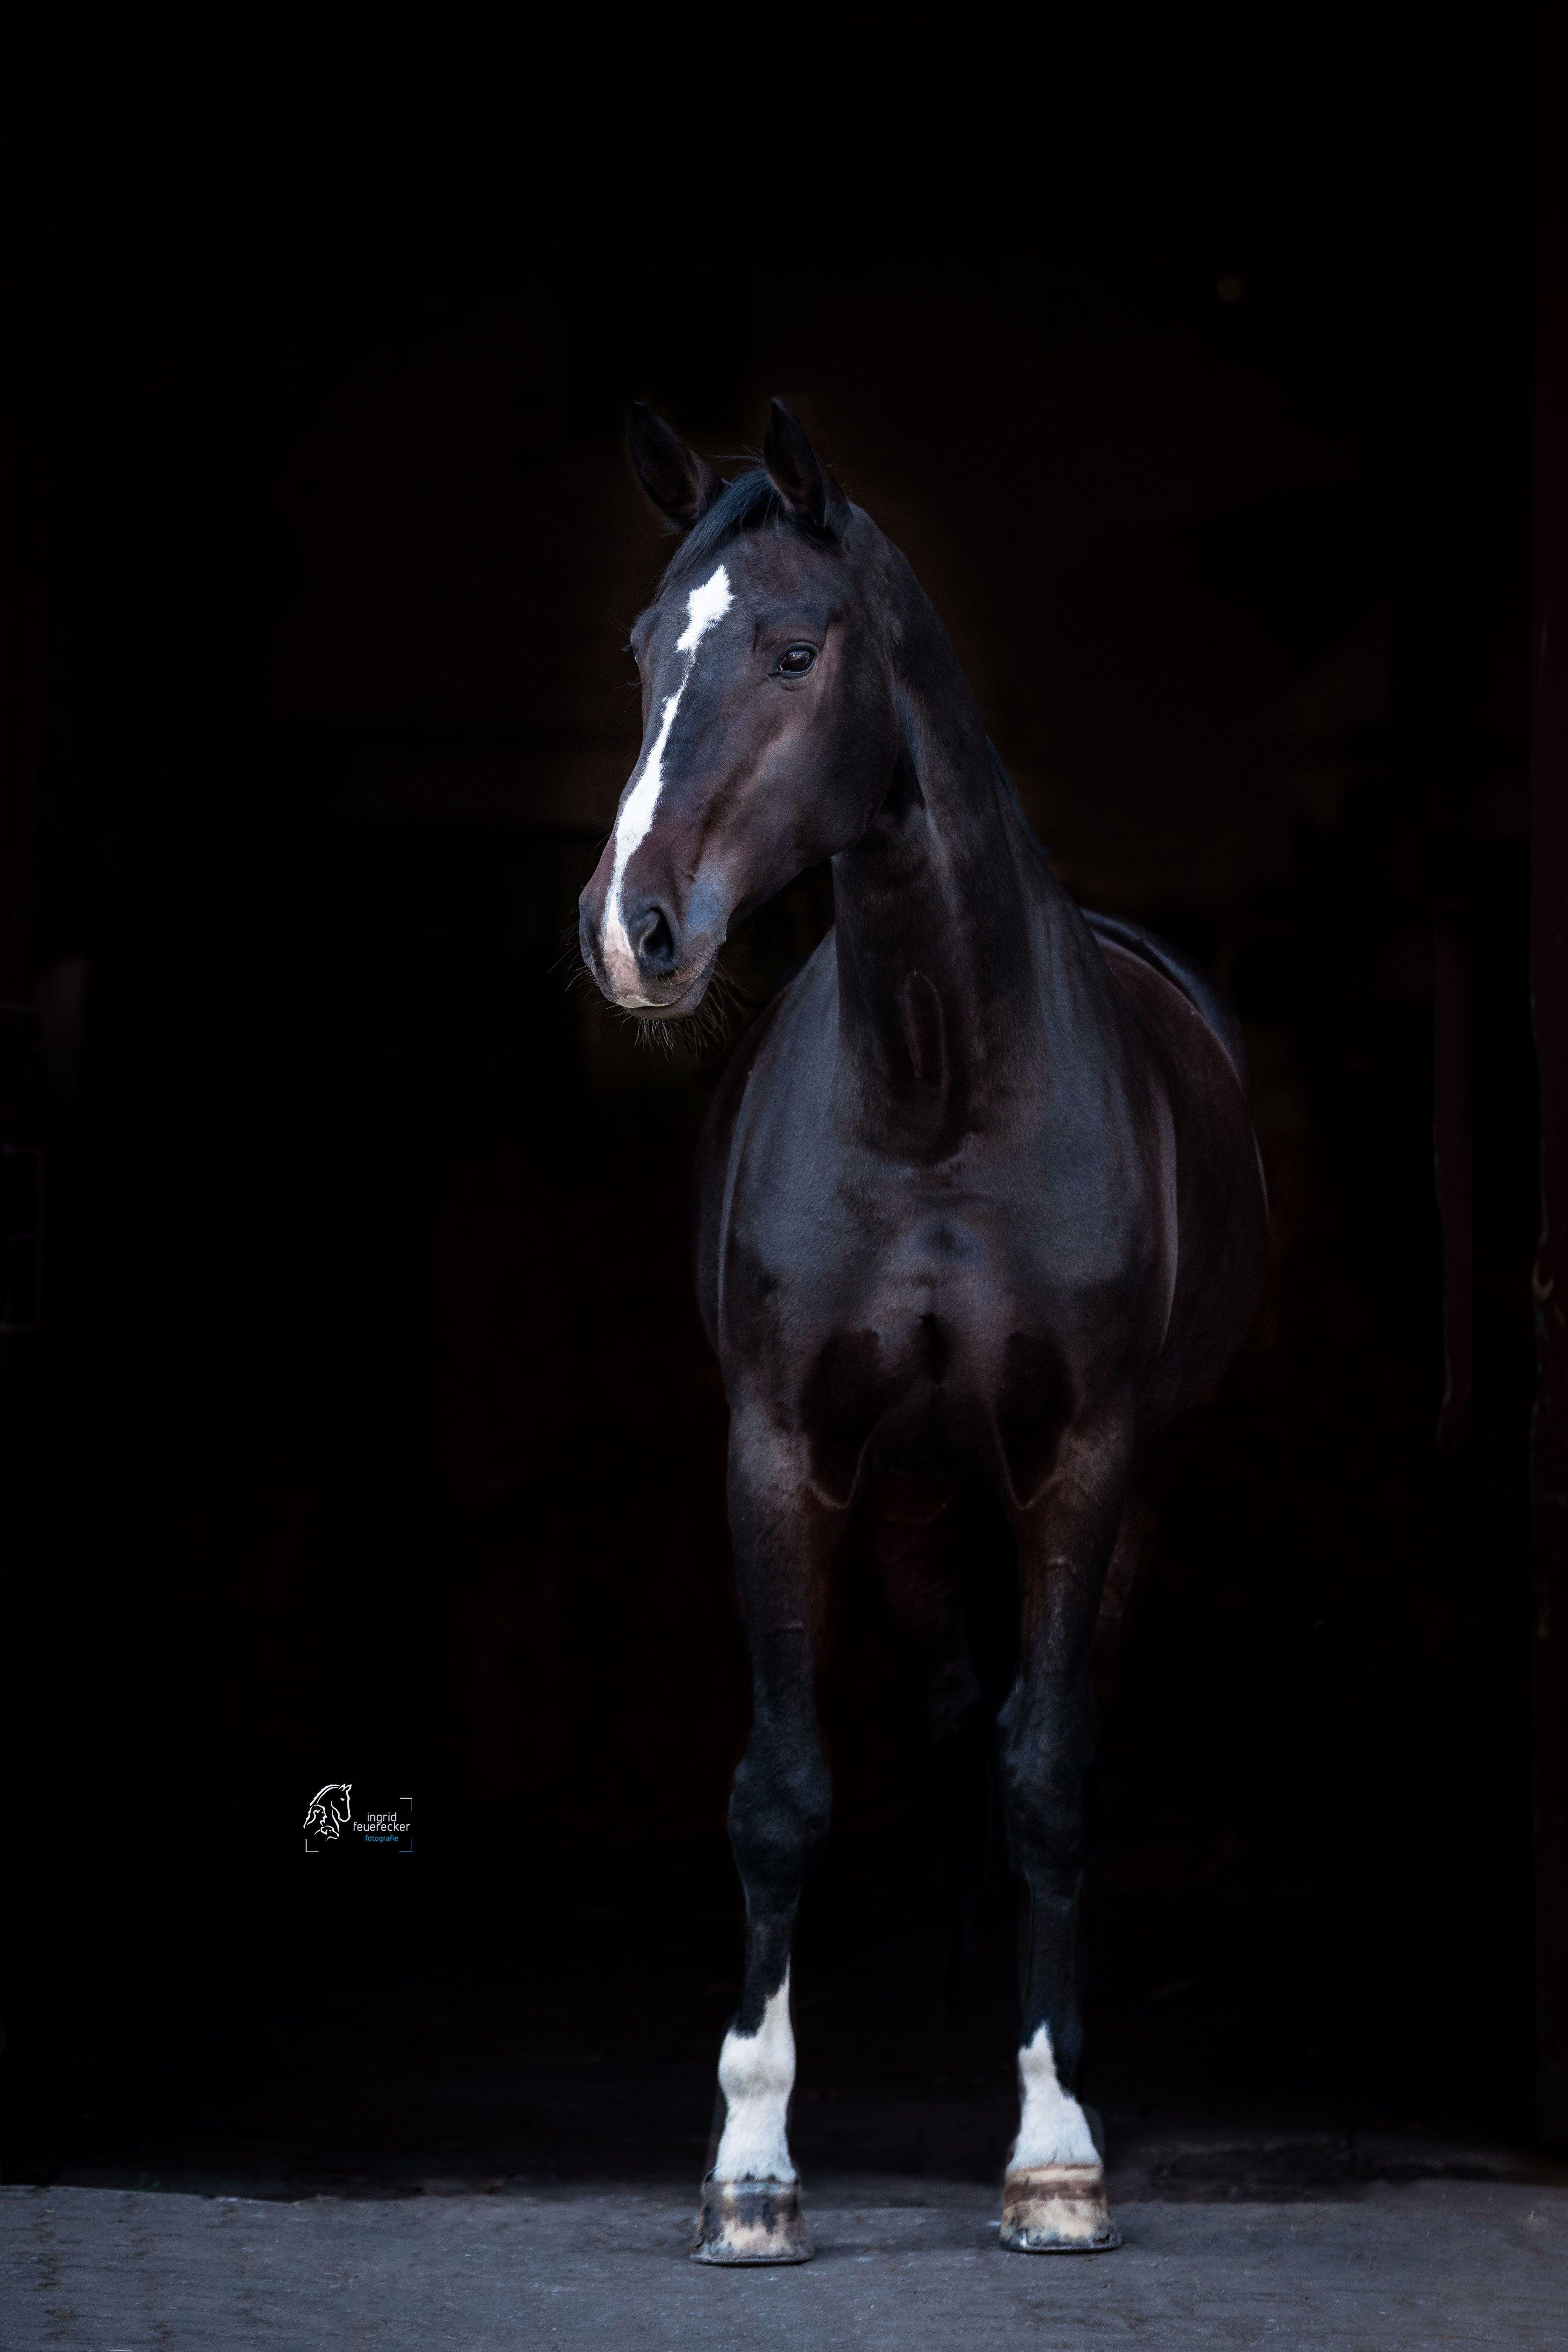 Ingrid Feuerecker Pferdefotografie   Ingrid Feuerecker Hundefotografie   Pferde vor schwarzem Hintergrund   Horse Photography   Equestrian   Equine Ph…